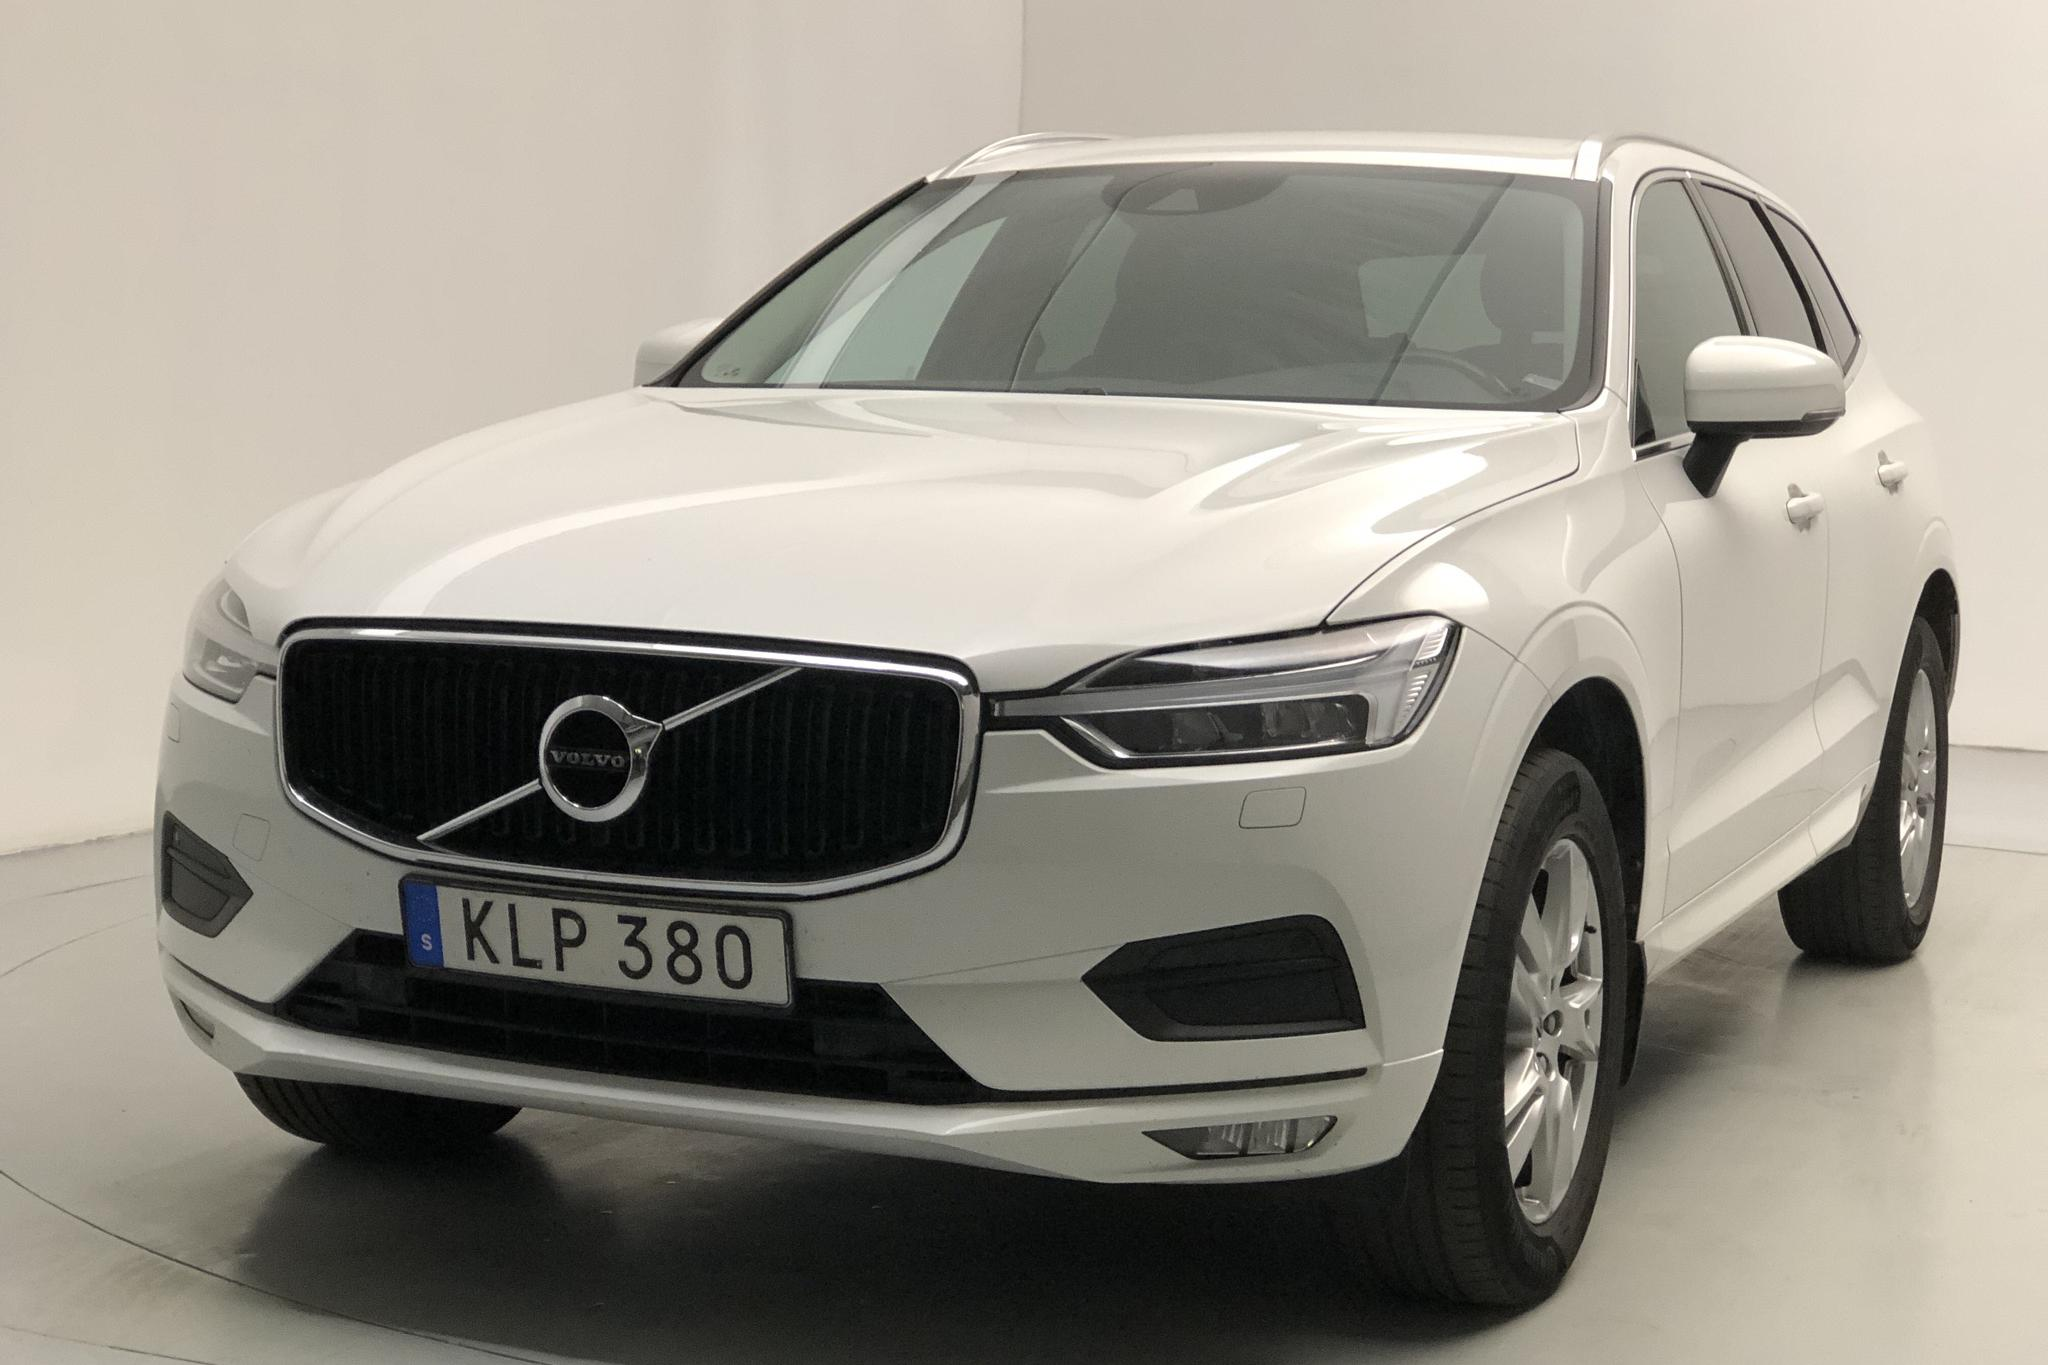 Volvo XC60 D4 AWD (190hk) - 106 370 km - Automatic - white - 2018